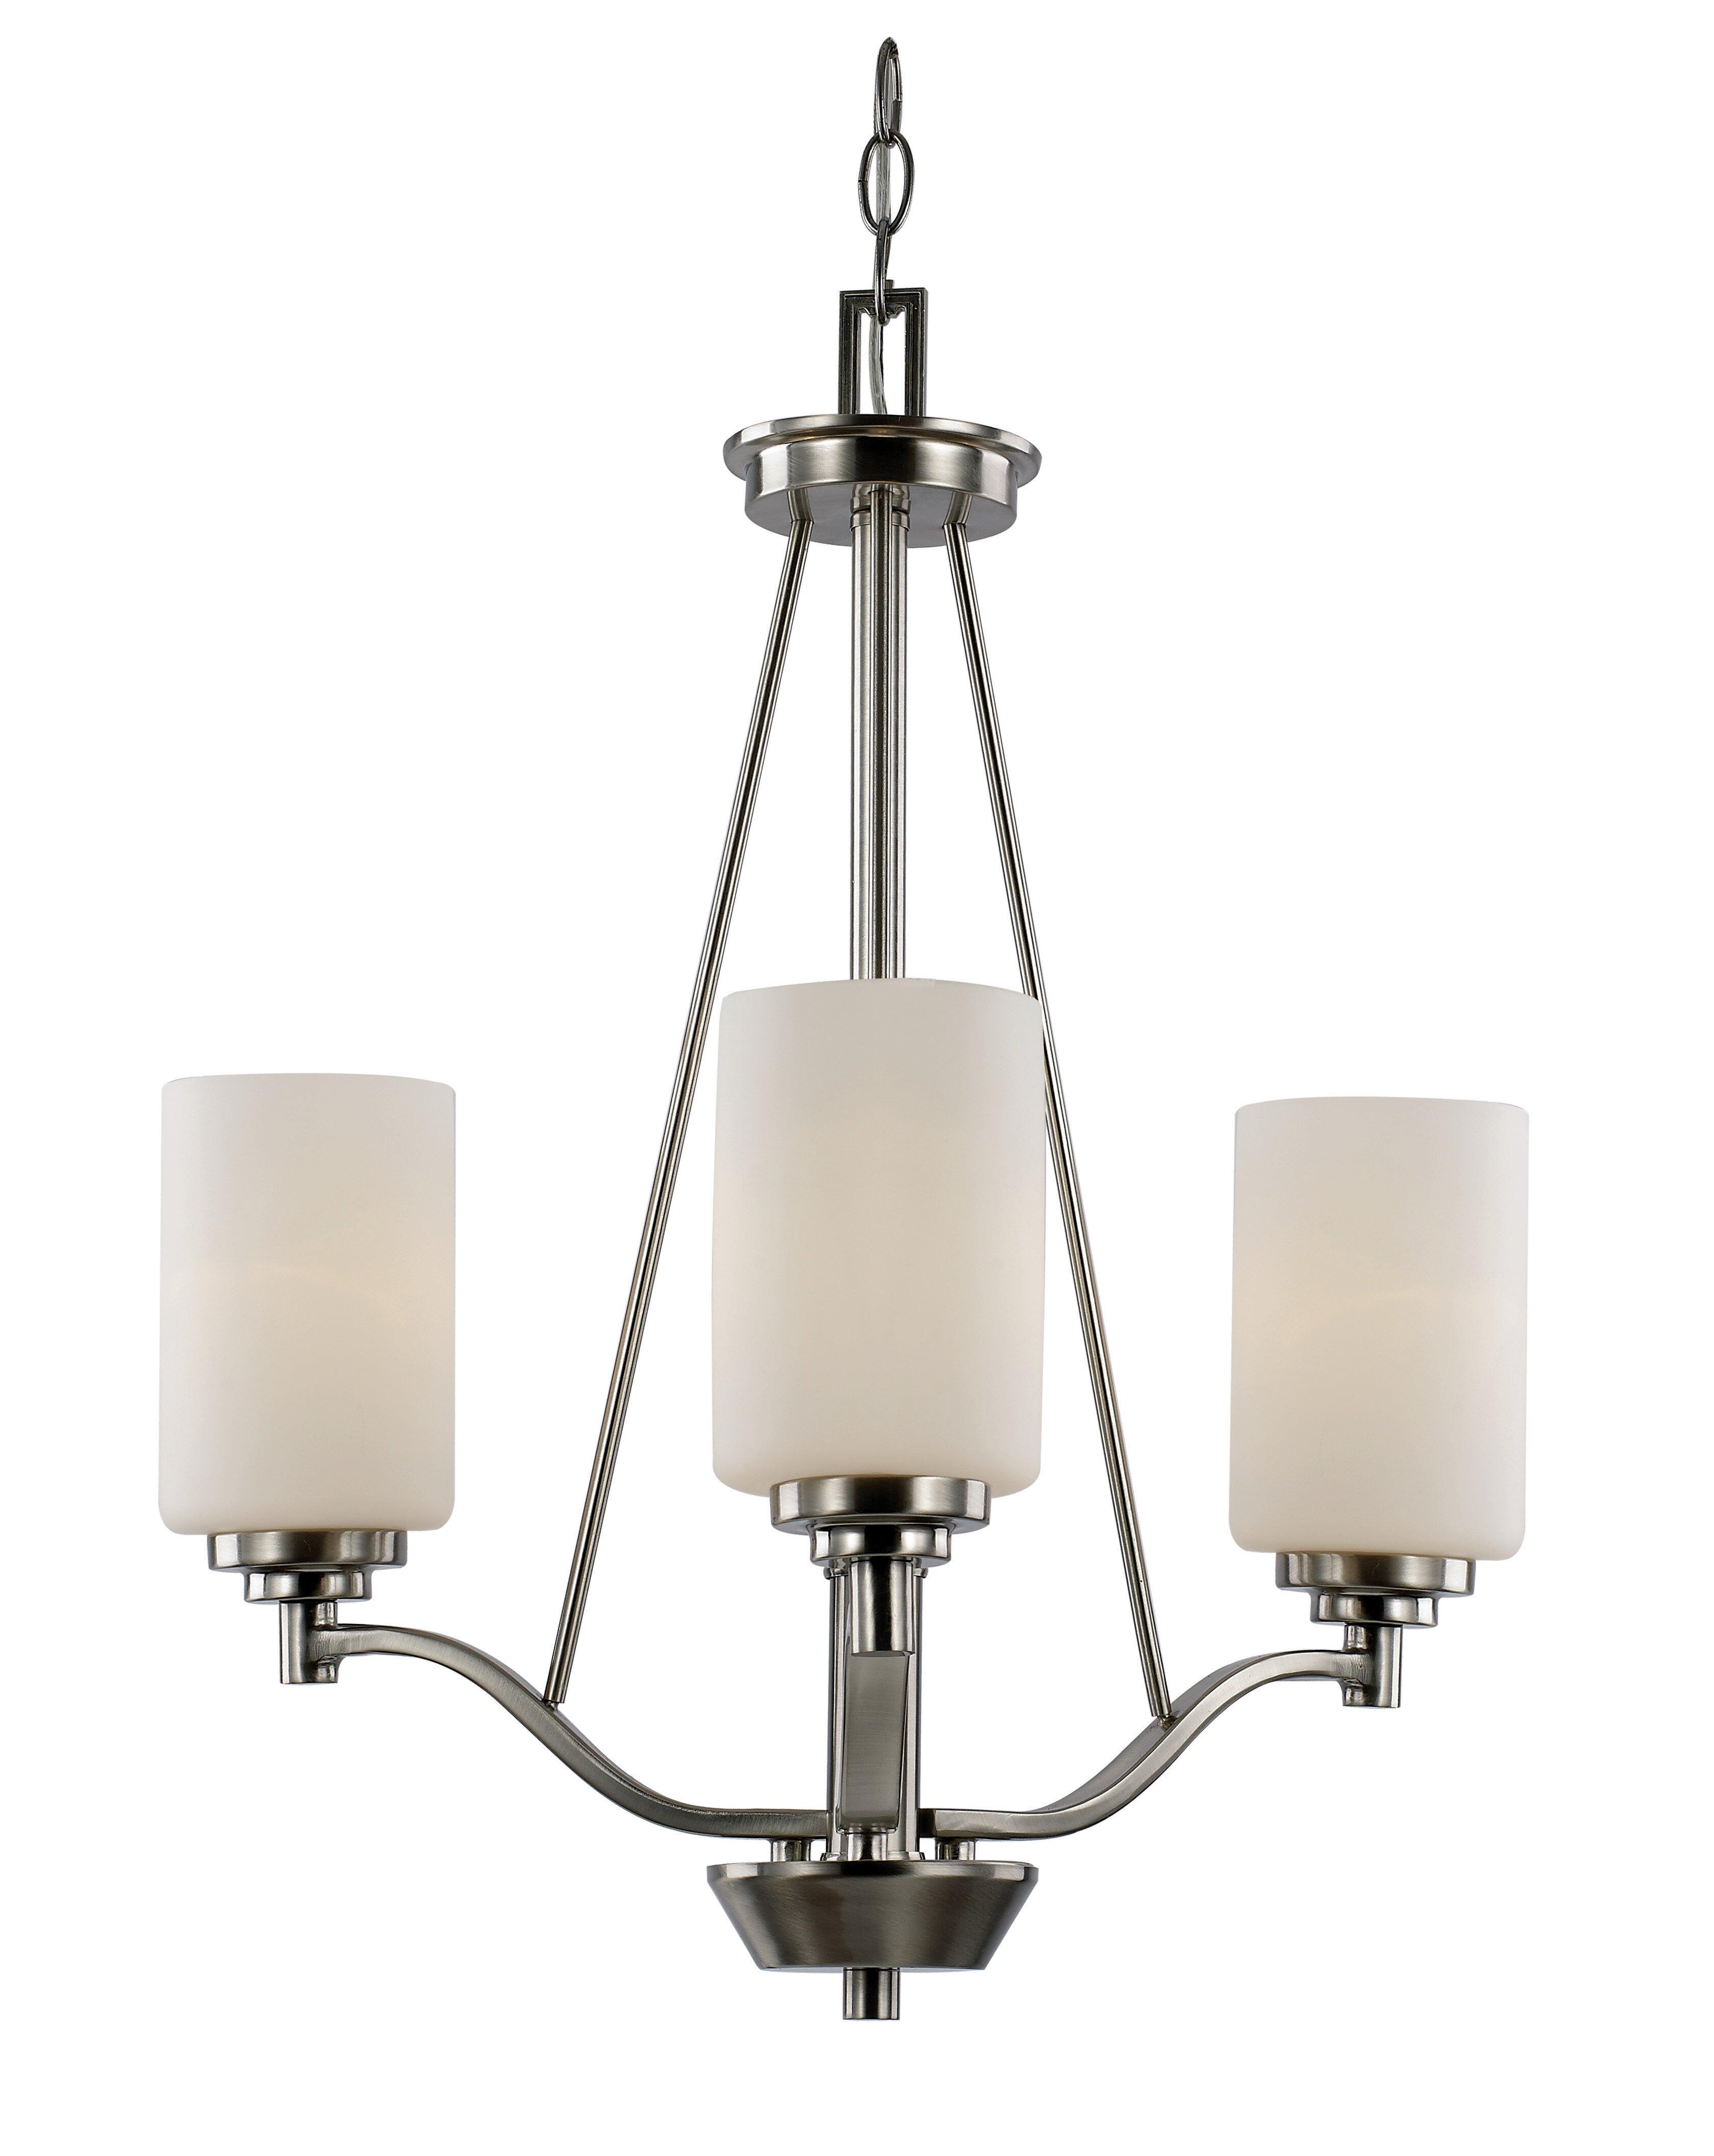 Red barrel studio juli 3 light shaded chandelier reviews wayfair